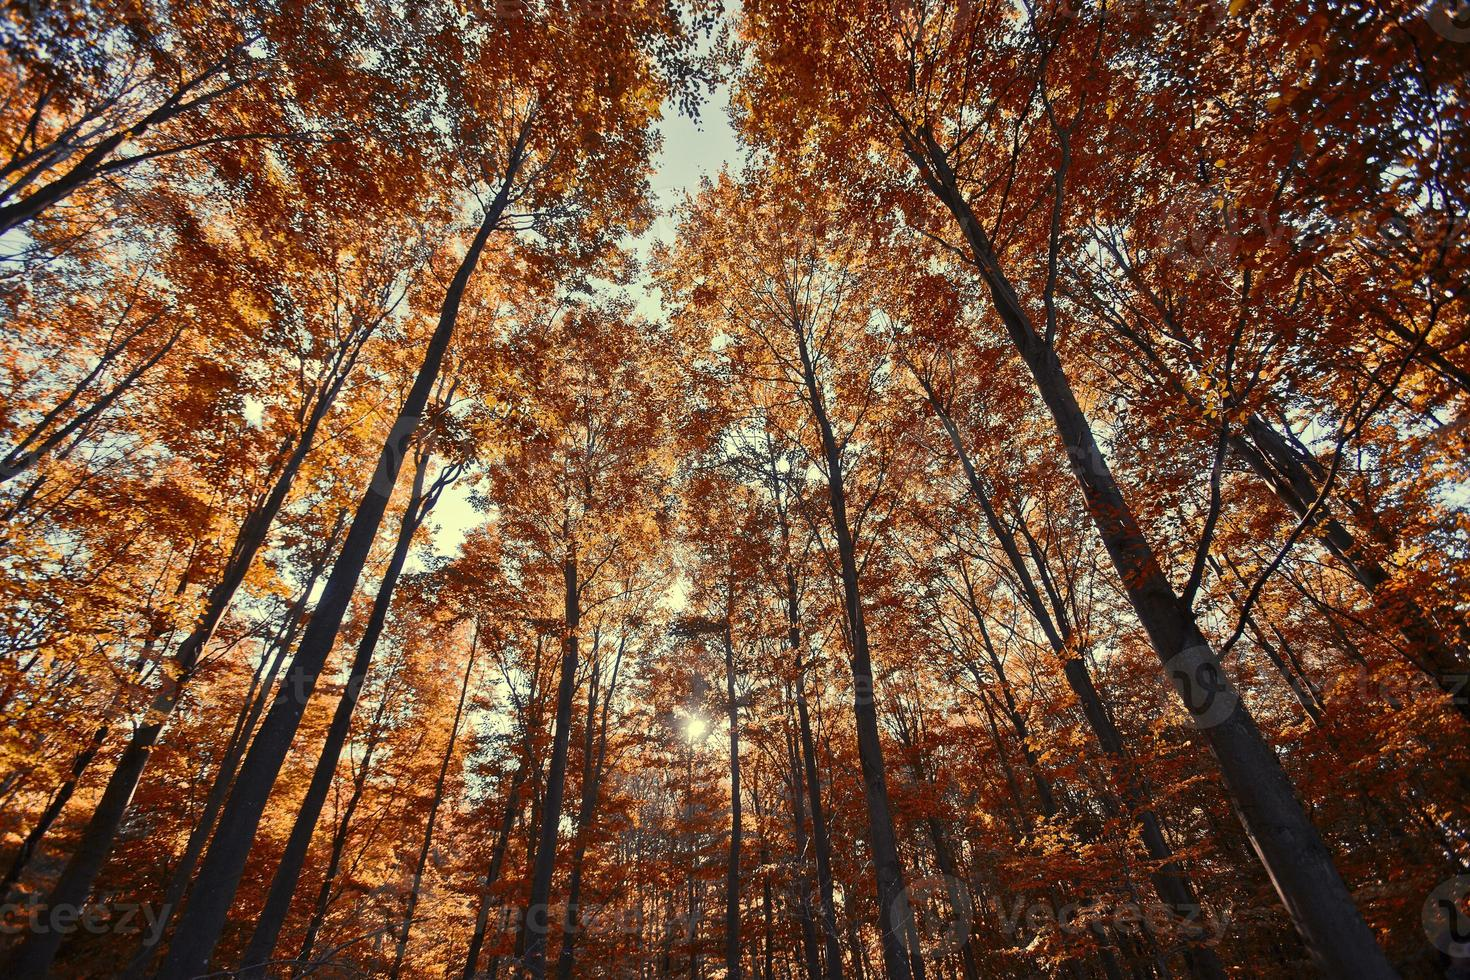 floresta outono, fundo colorido abstrato foto